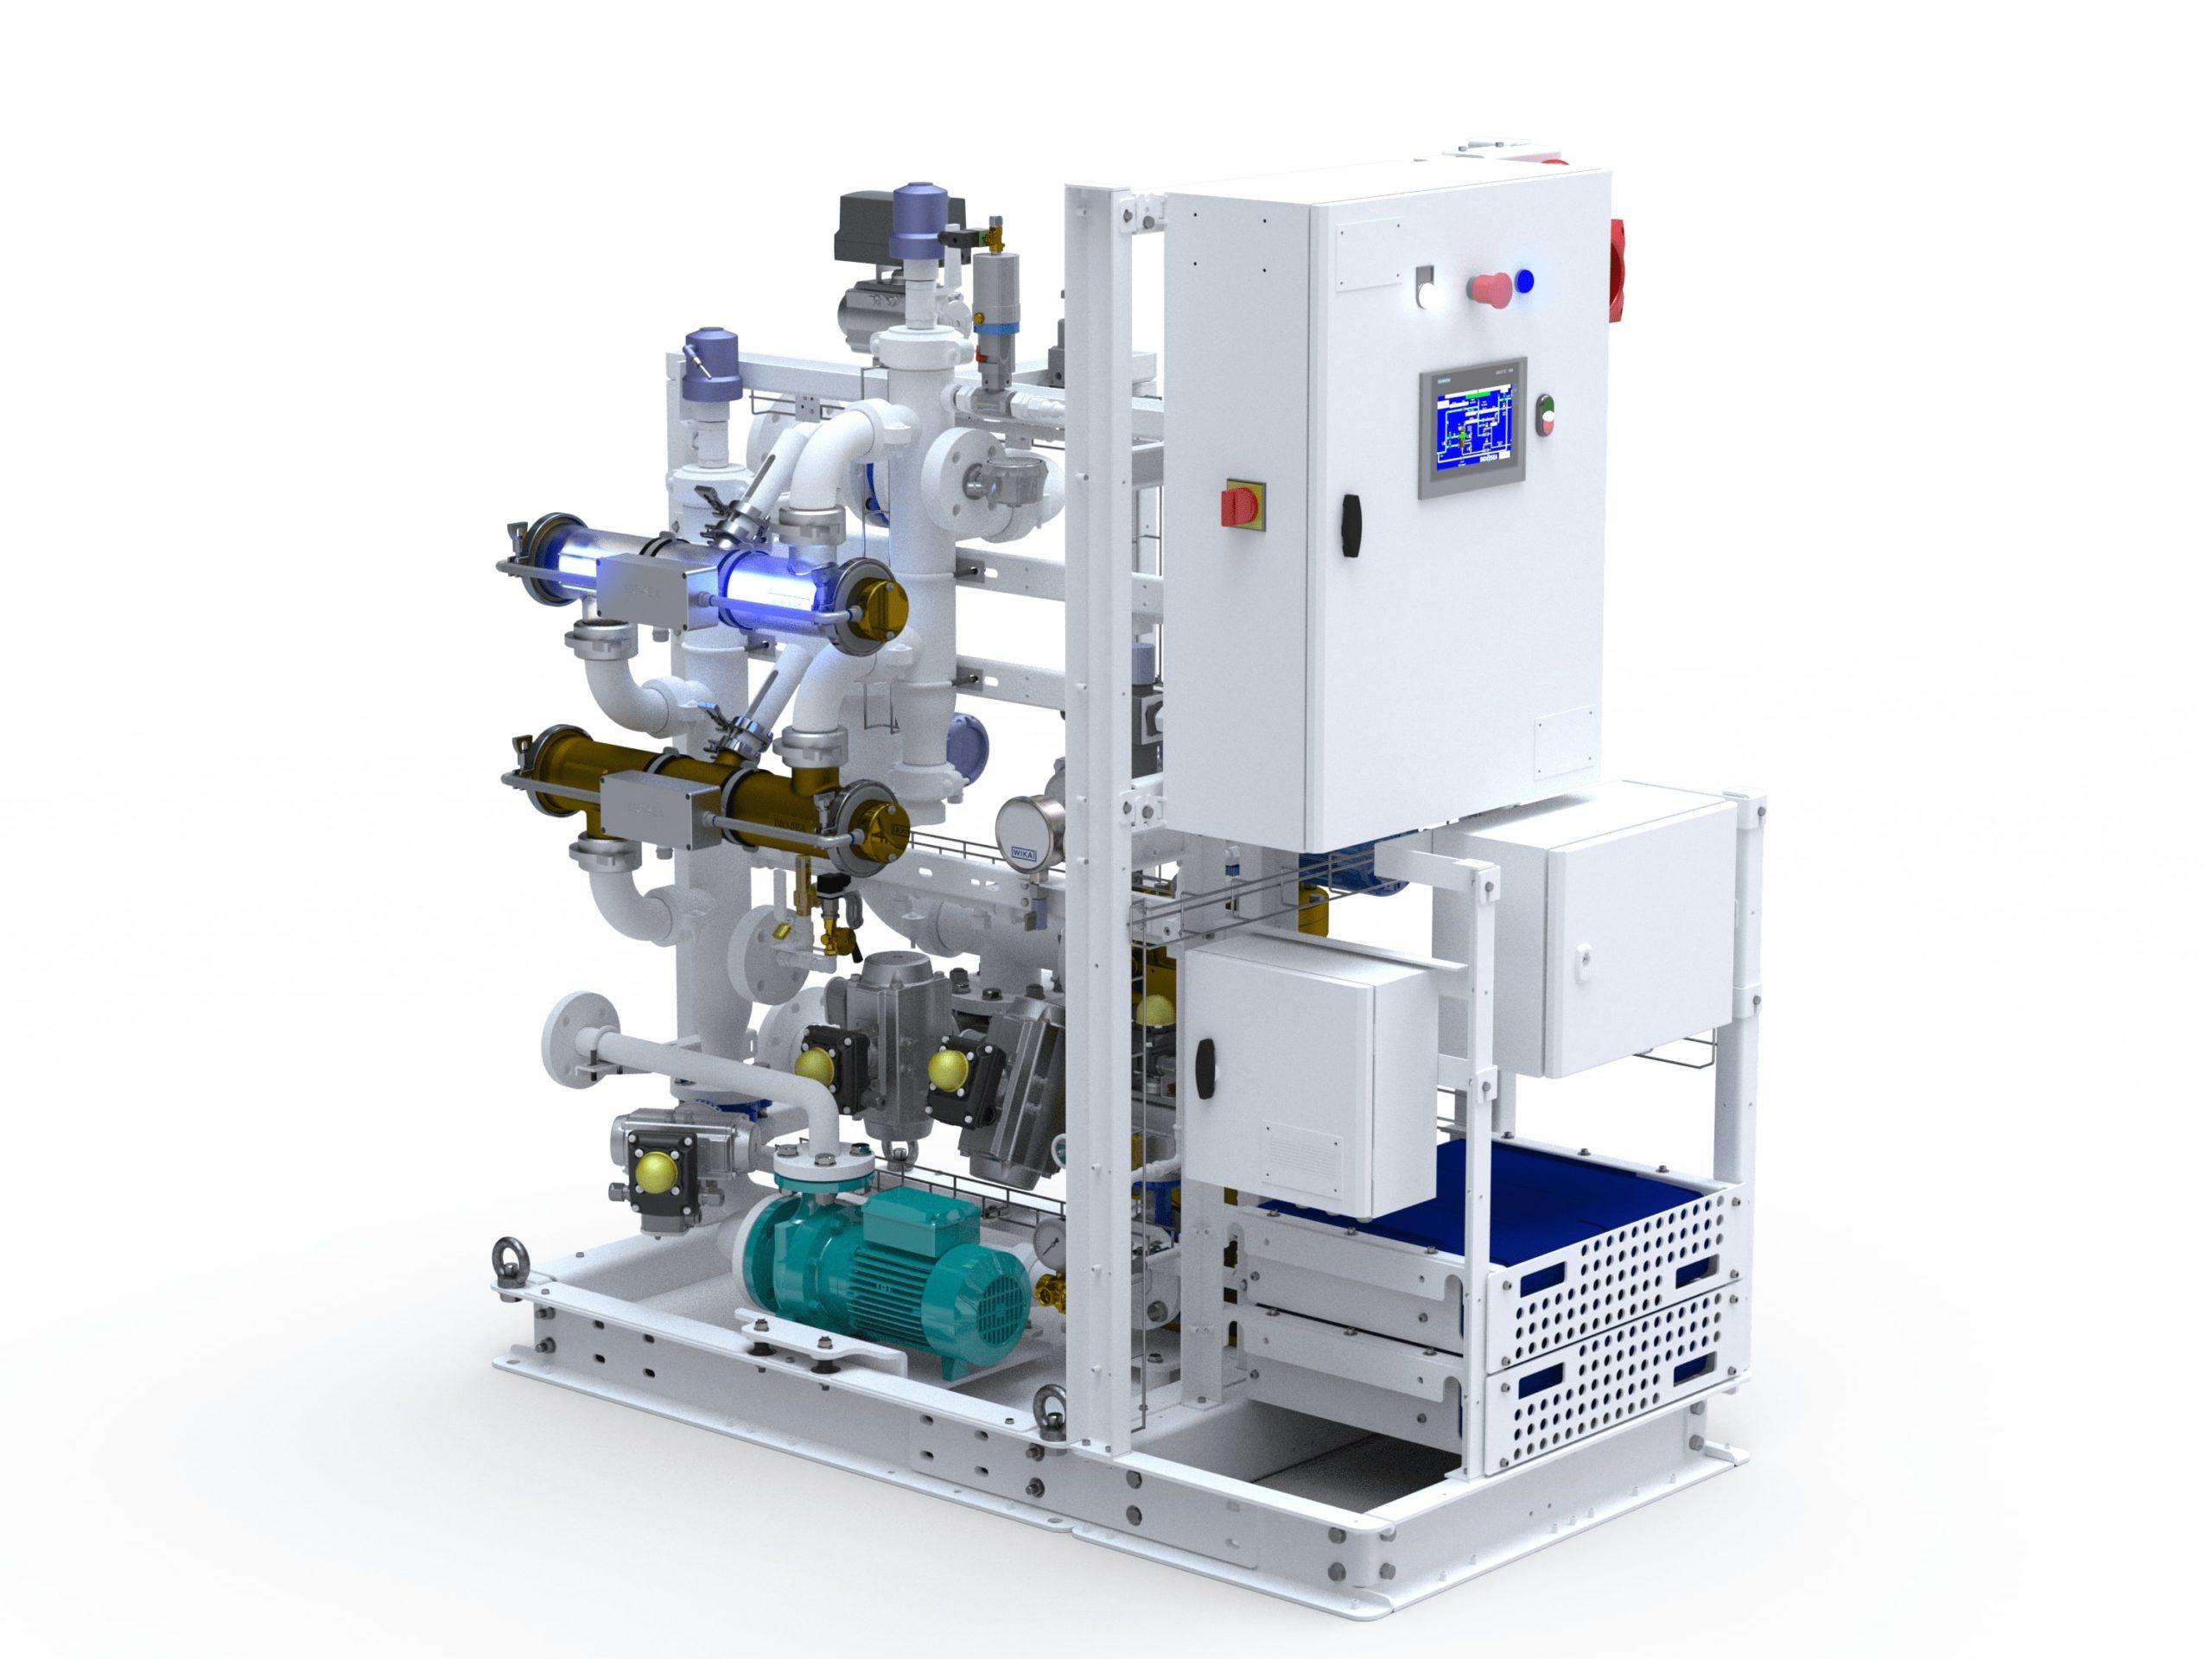 ECOSISTEMA E BALLAST WATER TREATMENT SYSTEM